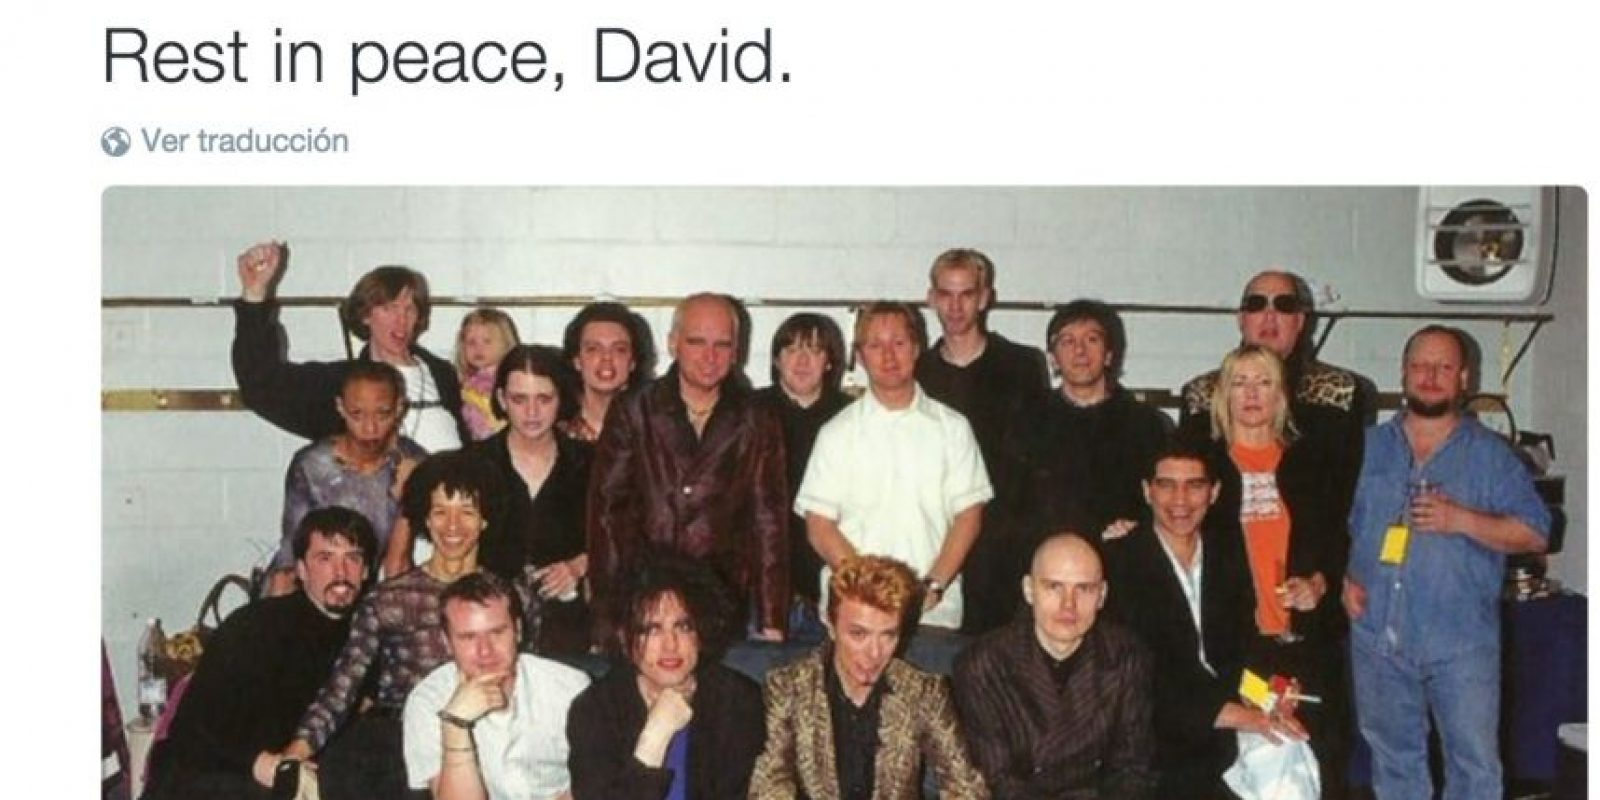 Foo Fighters: Que descanse en paz, David Foto:Twitter.com